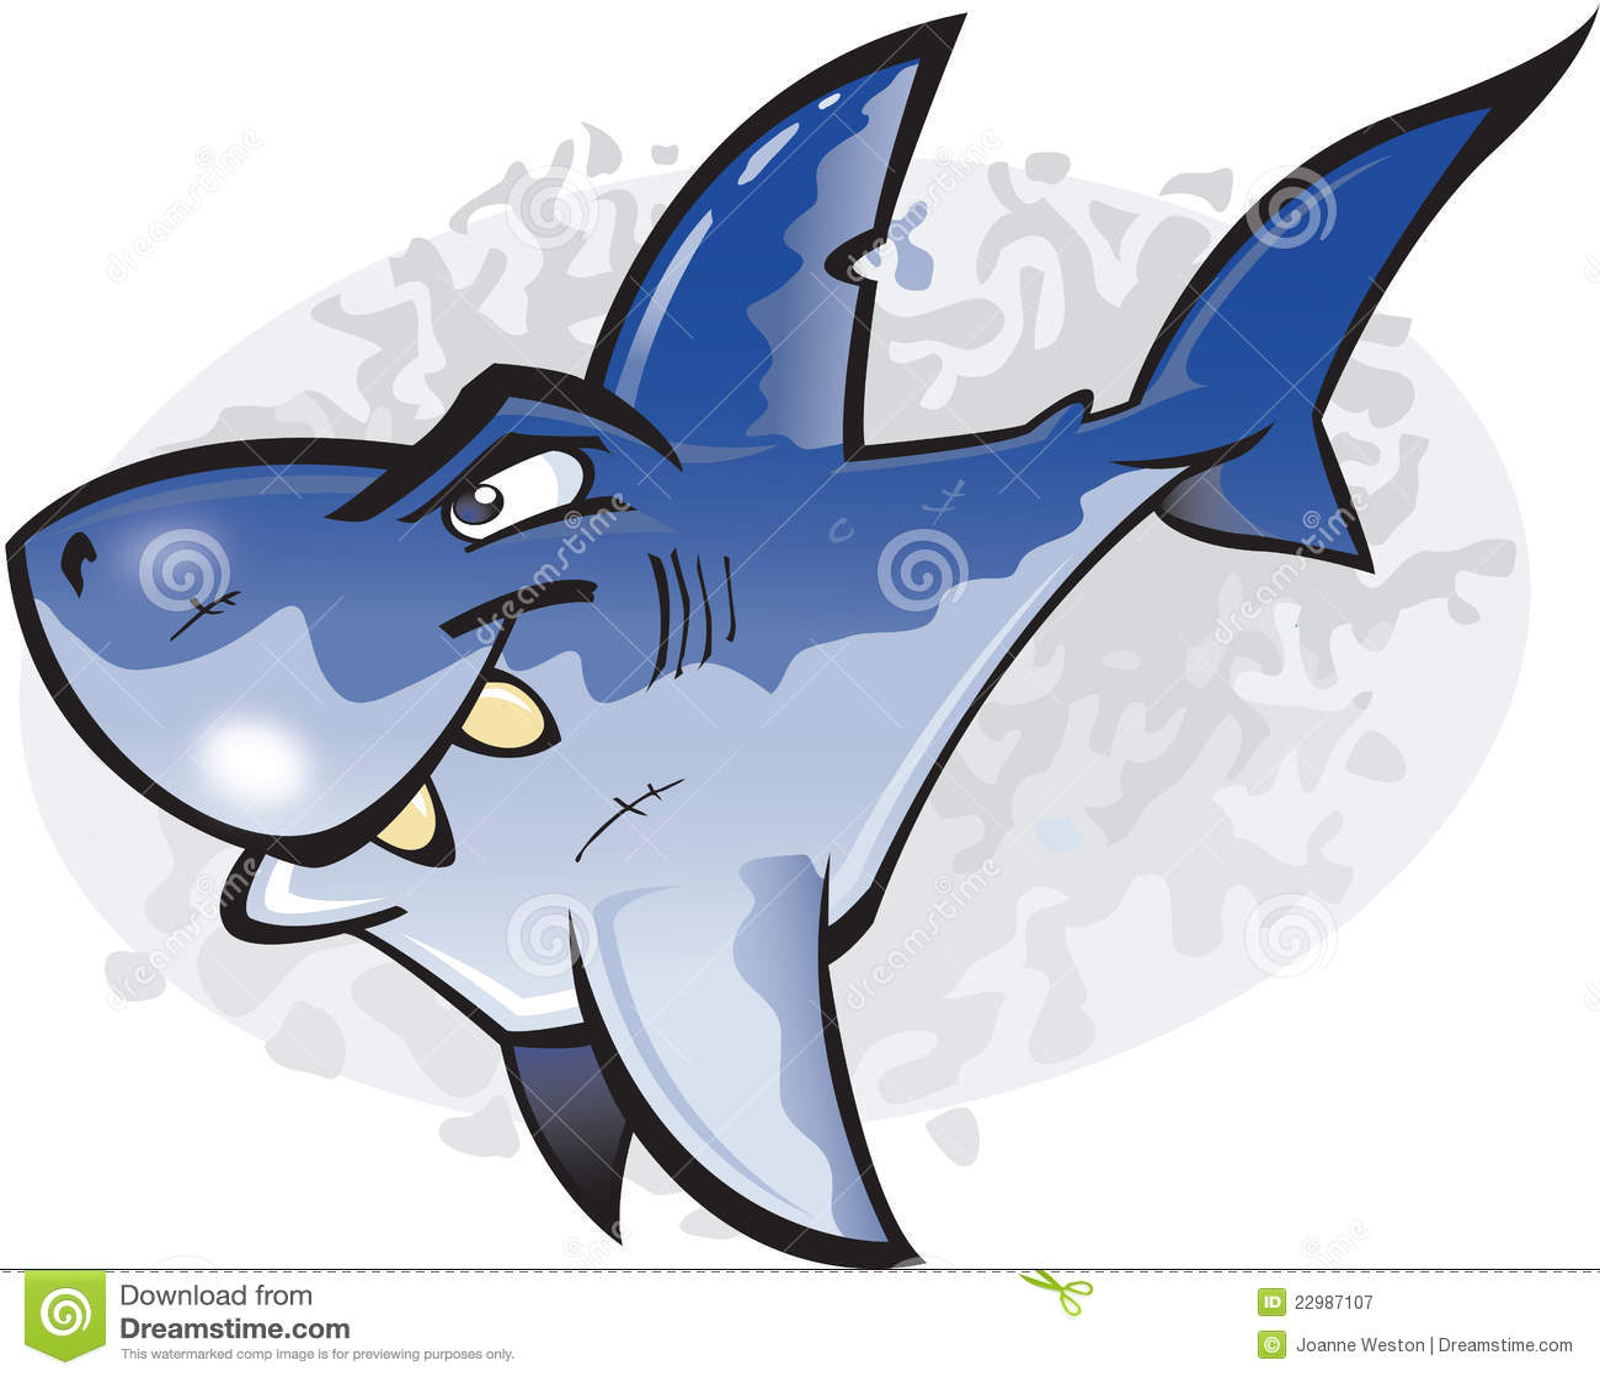 Warriors Sharks Live Stream Free: Great White Shark Cartoon Images